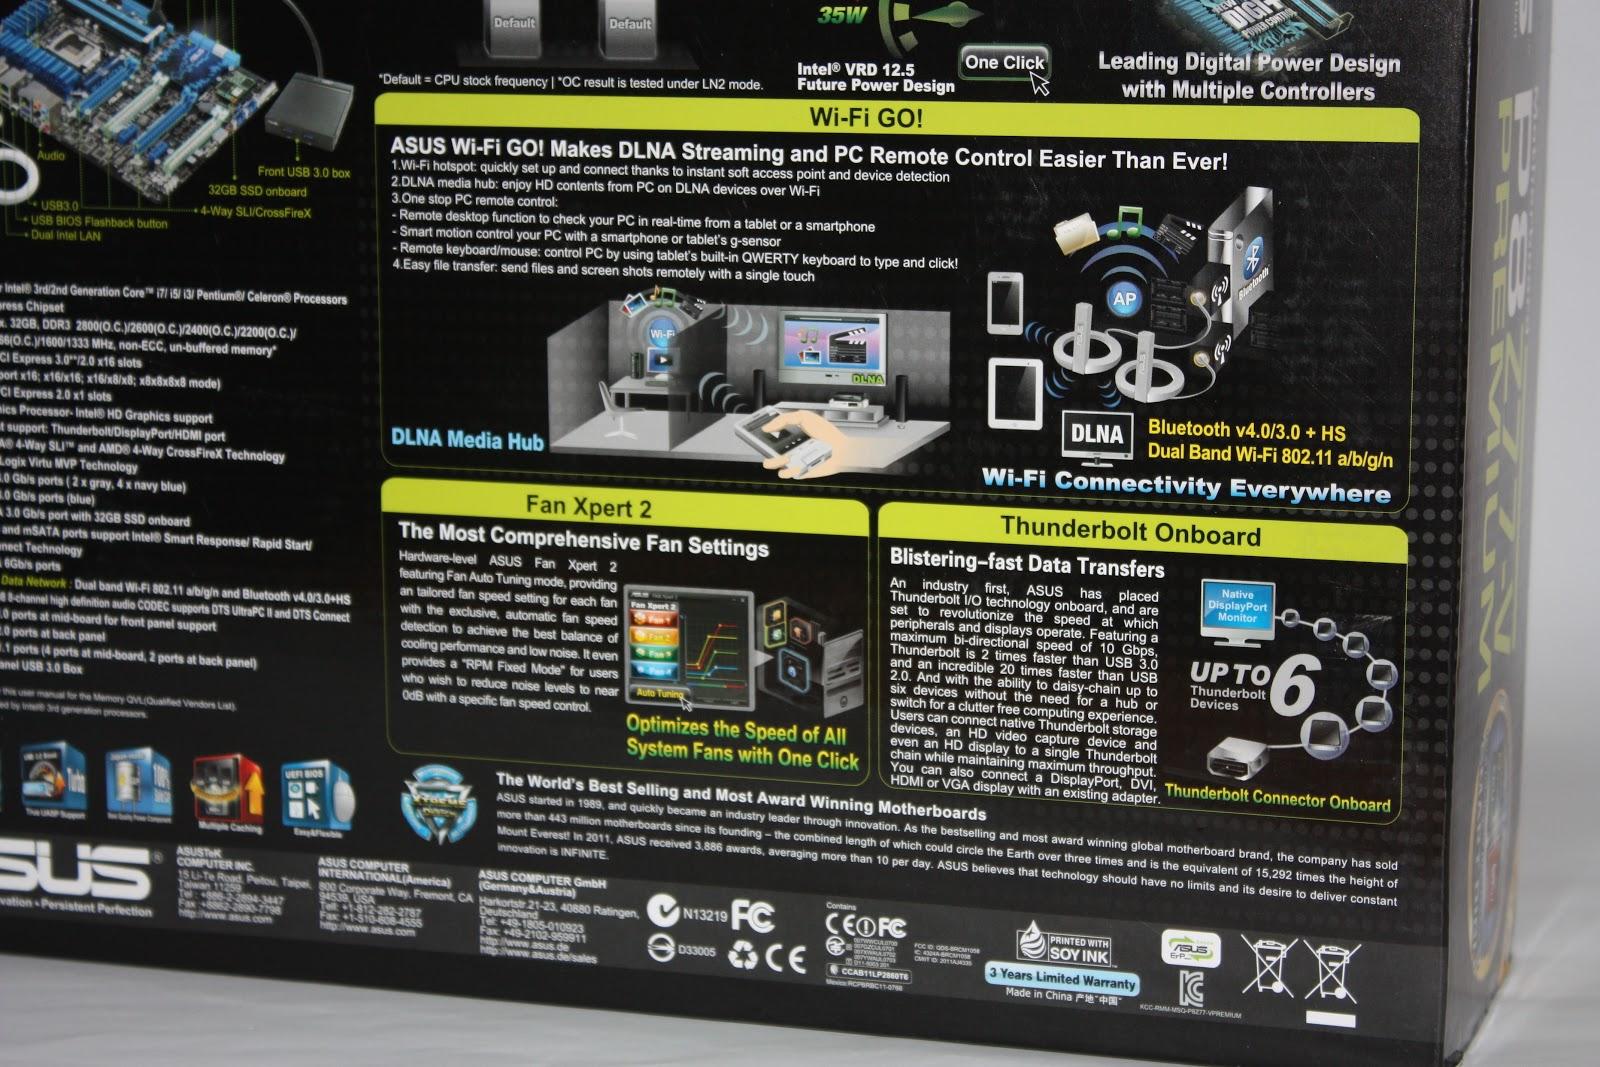 Asus P8z77 V Premium Motherboard Review The Tech Revolutionist Multi Core X8 4x Super Fans Upto 17 Deepcool Notebook Cooler Features